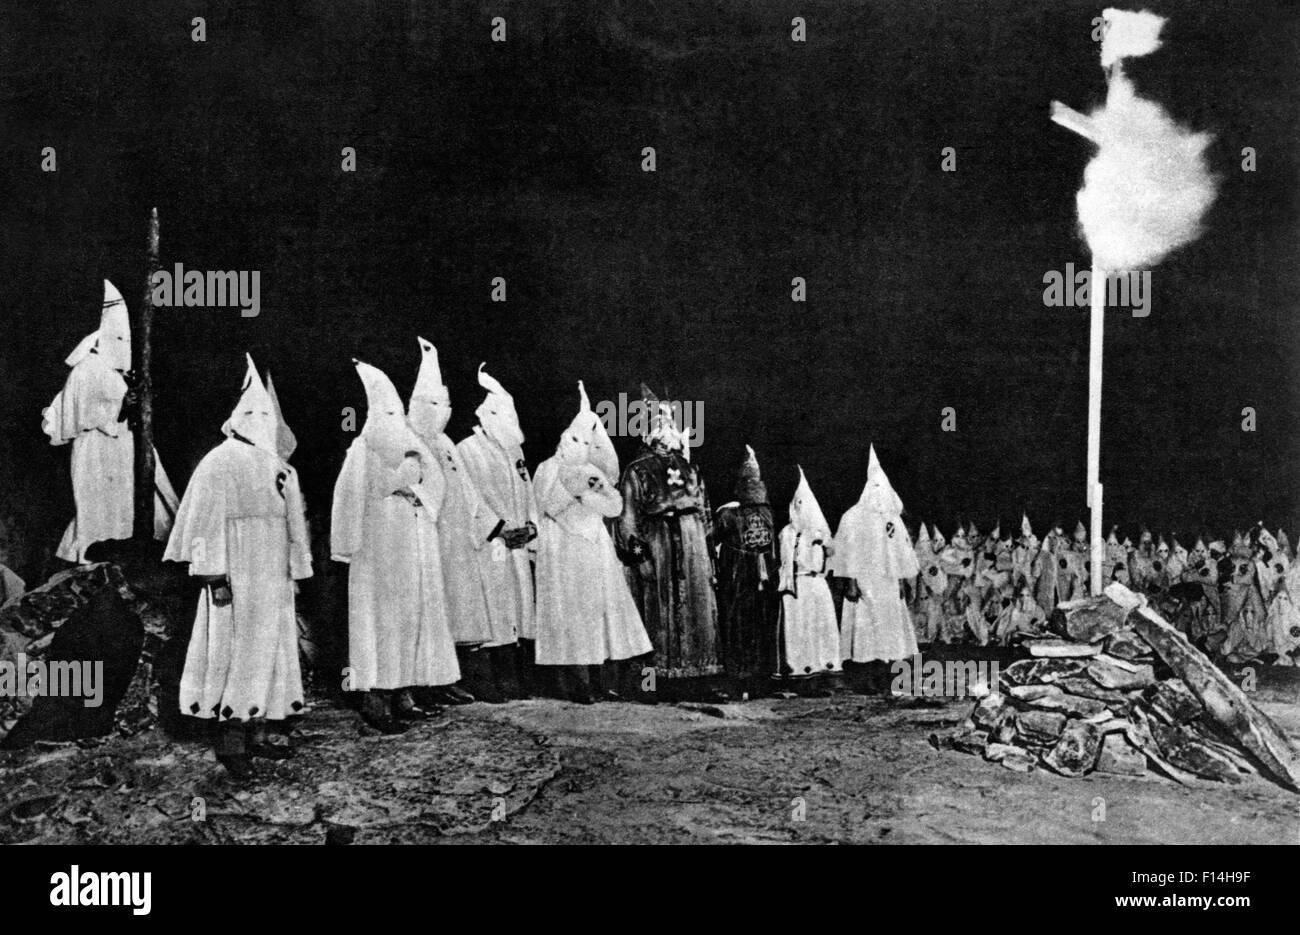 1930s ku klux klan kkk gathering with imperial wizard